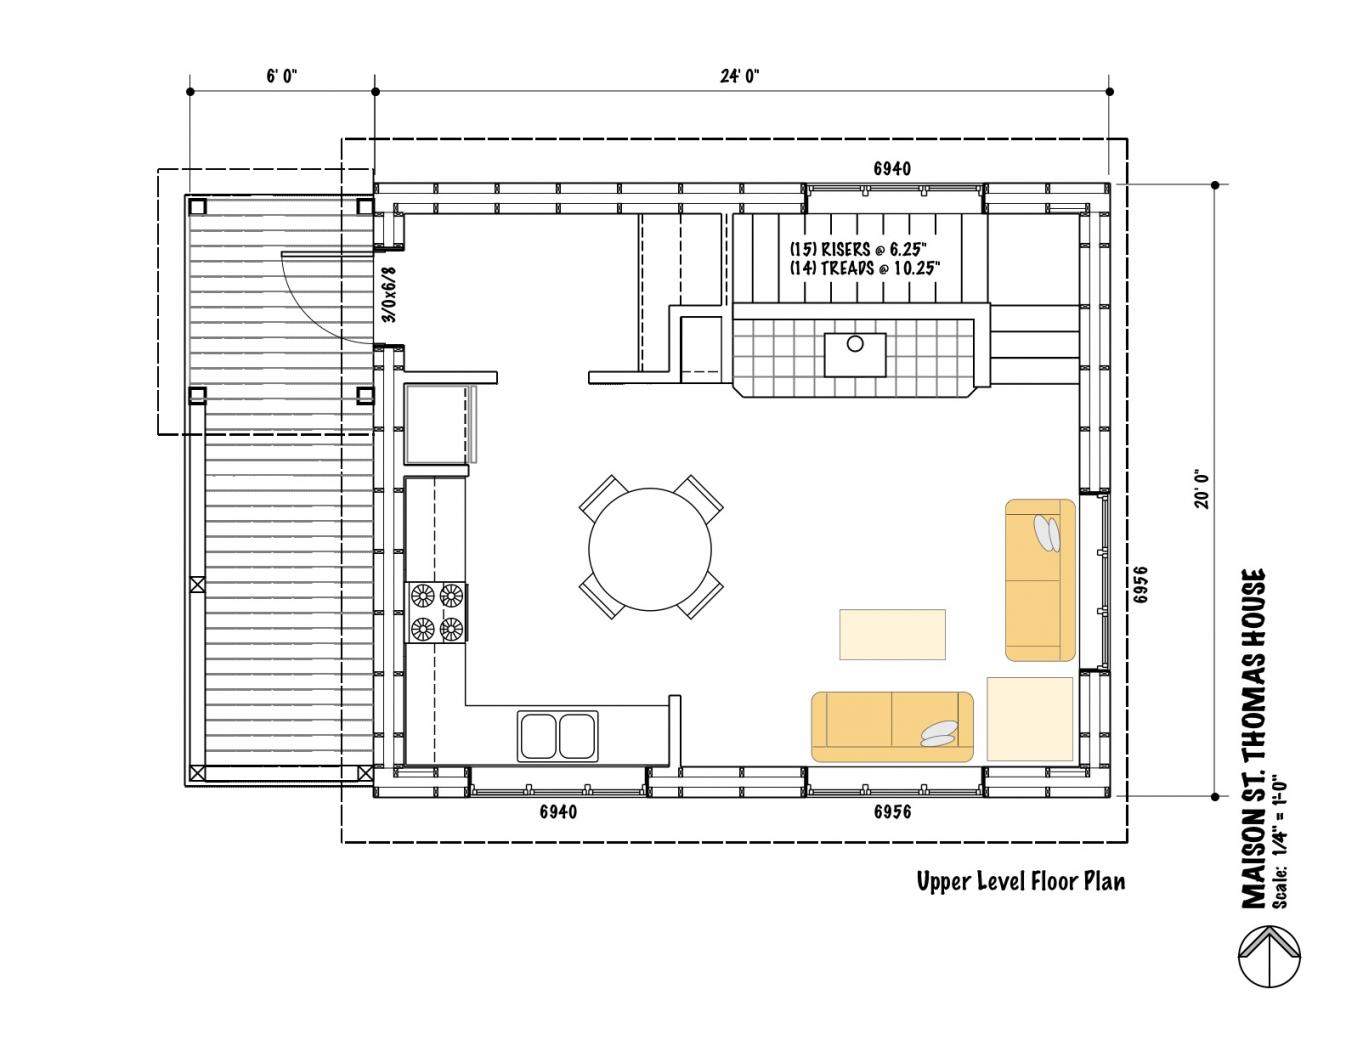 u shaped kitchen floor plans photo - 8